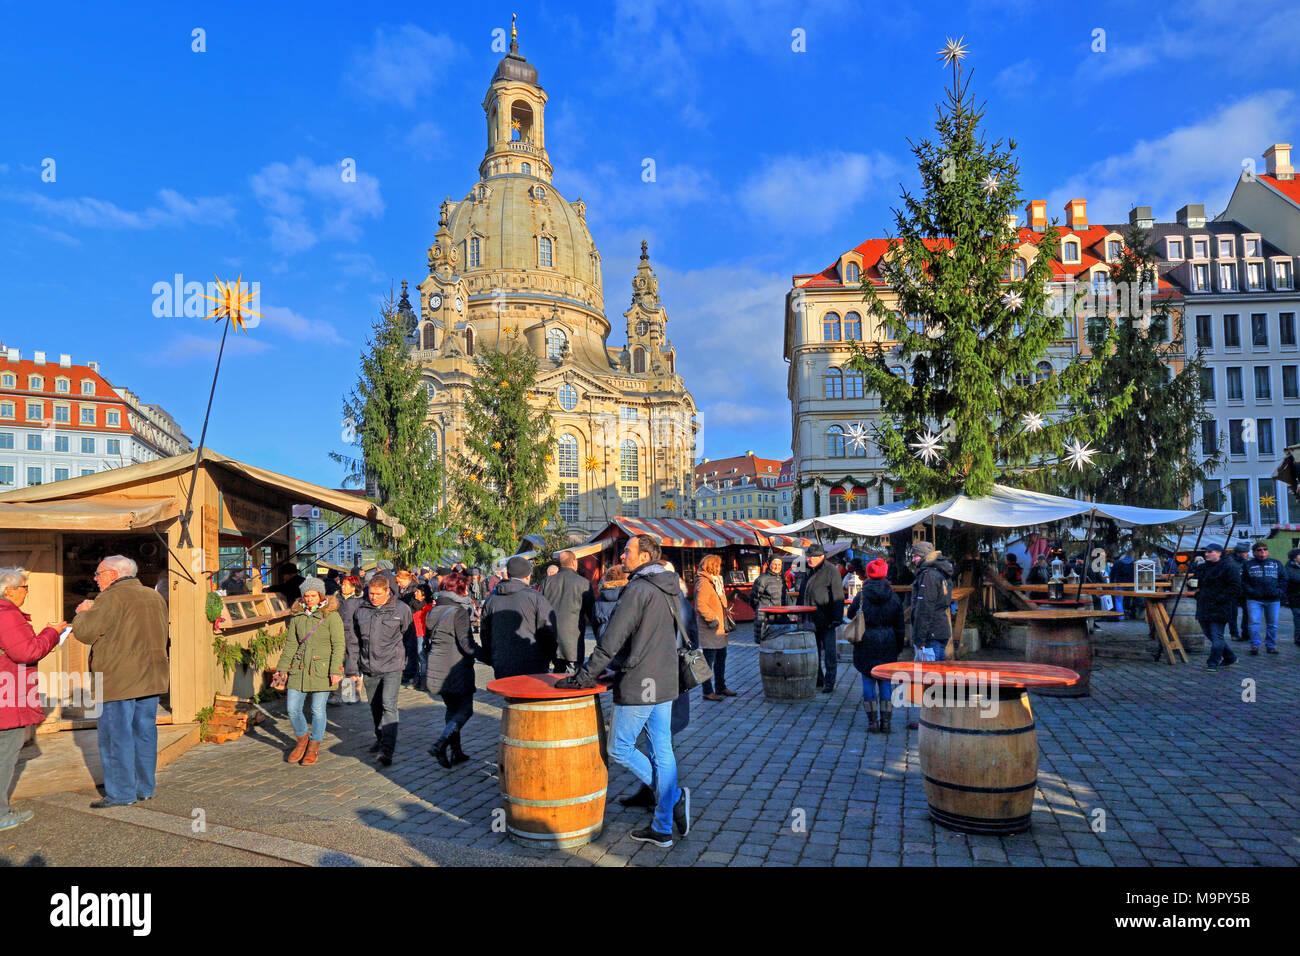 Christmas market on the Neumarkt with Frauenkirche, Dresden, Saxony, Germany Stock Photo